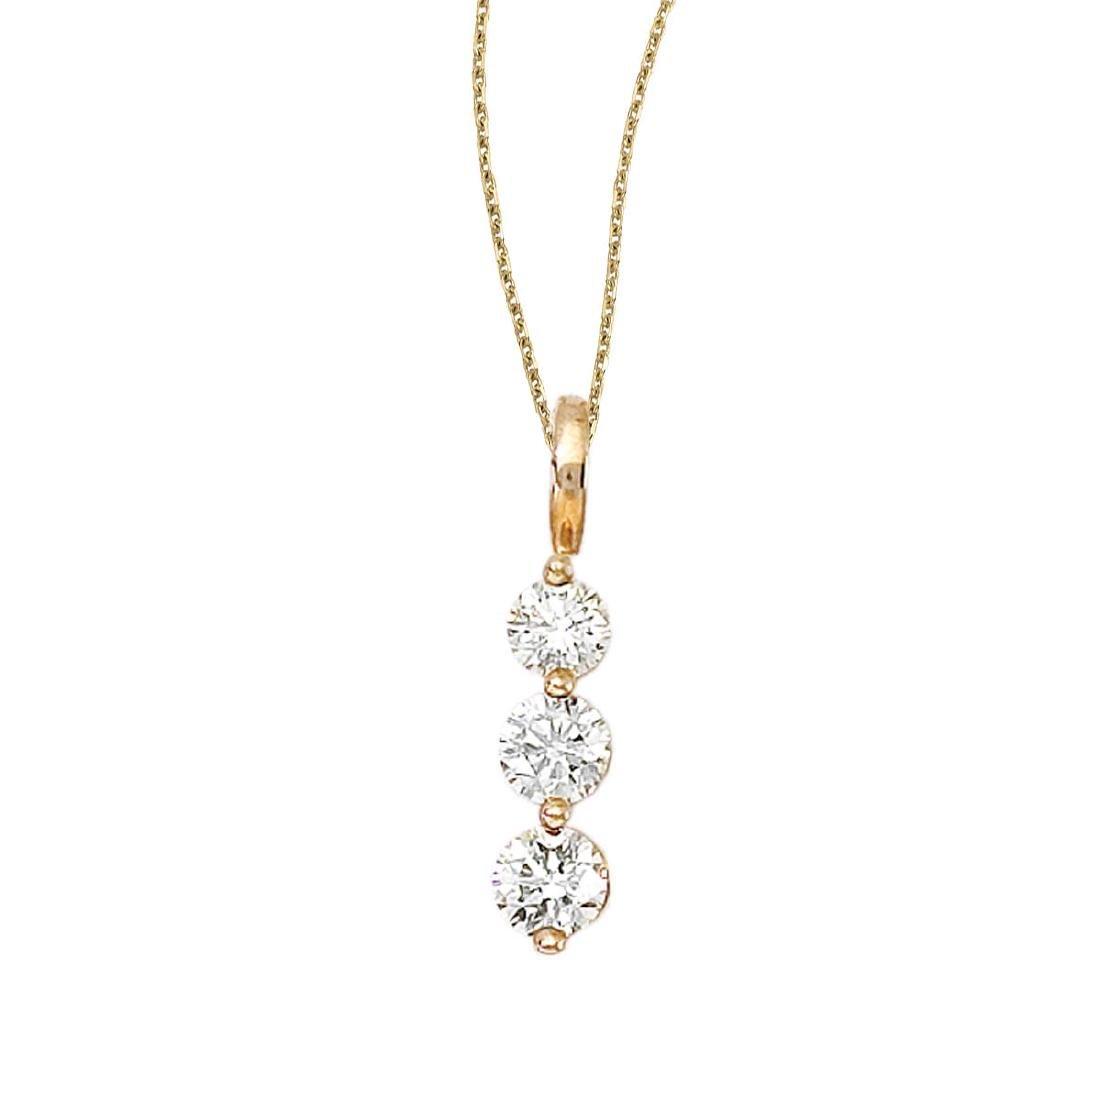 Certi.14k Yellow Gold 3 Stone .75ctw Diamond Drop Pend